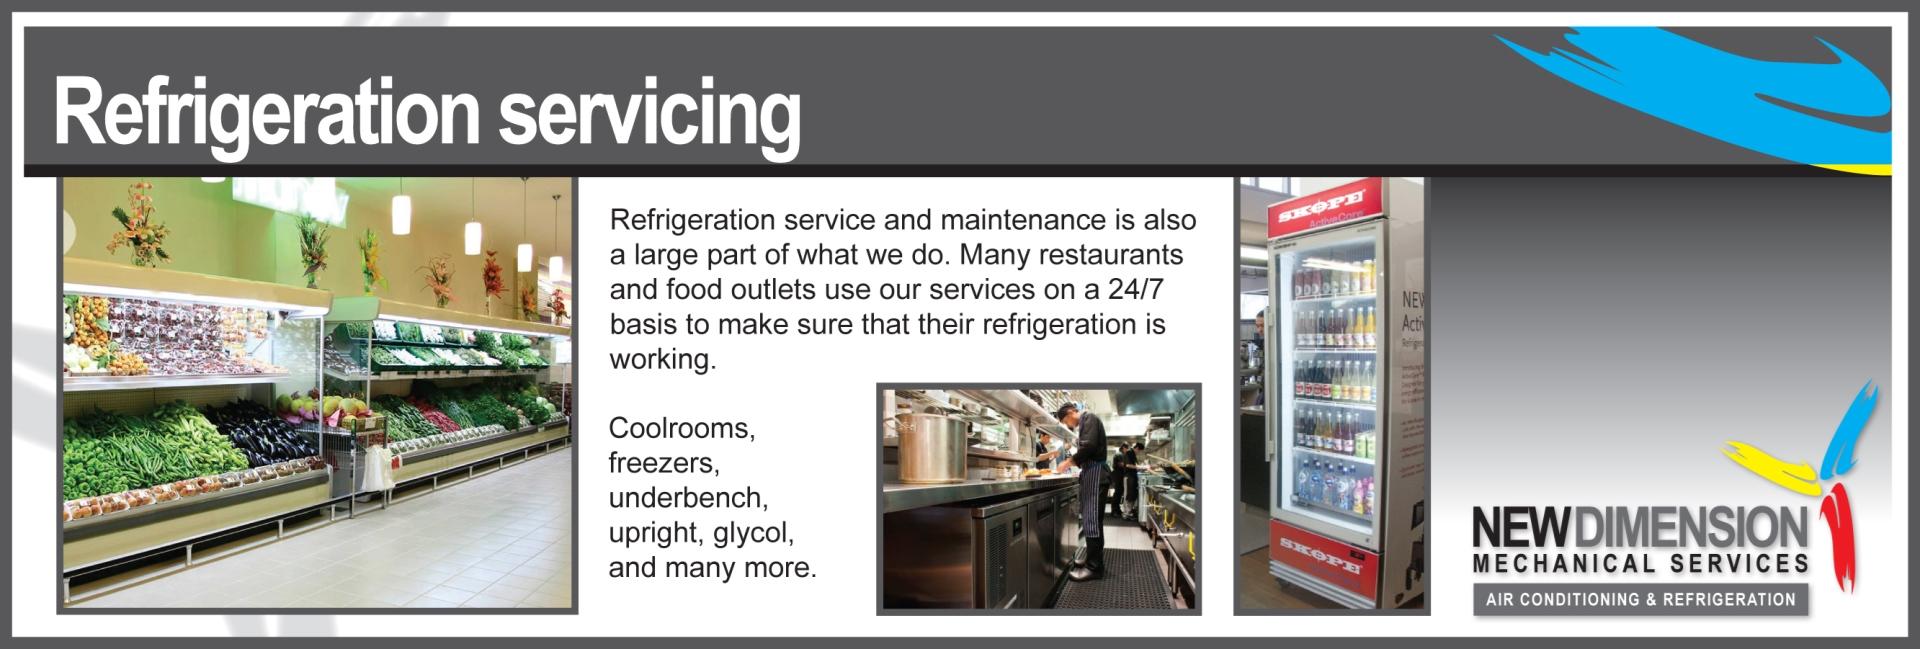 NDMS Slider Refridgeration service